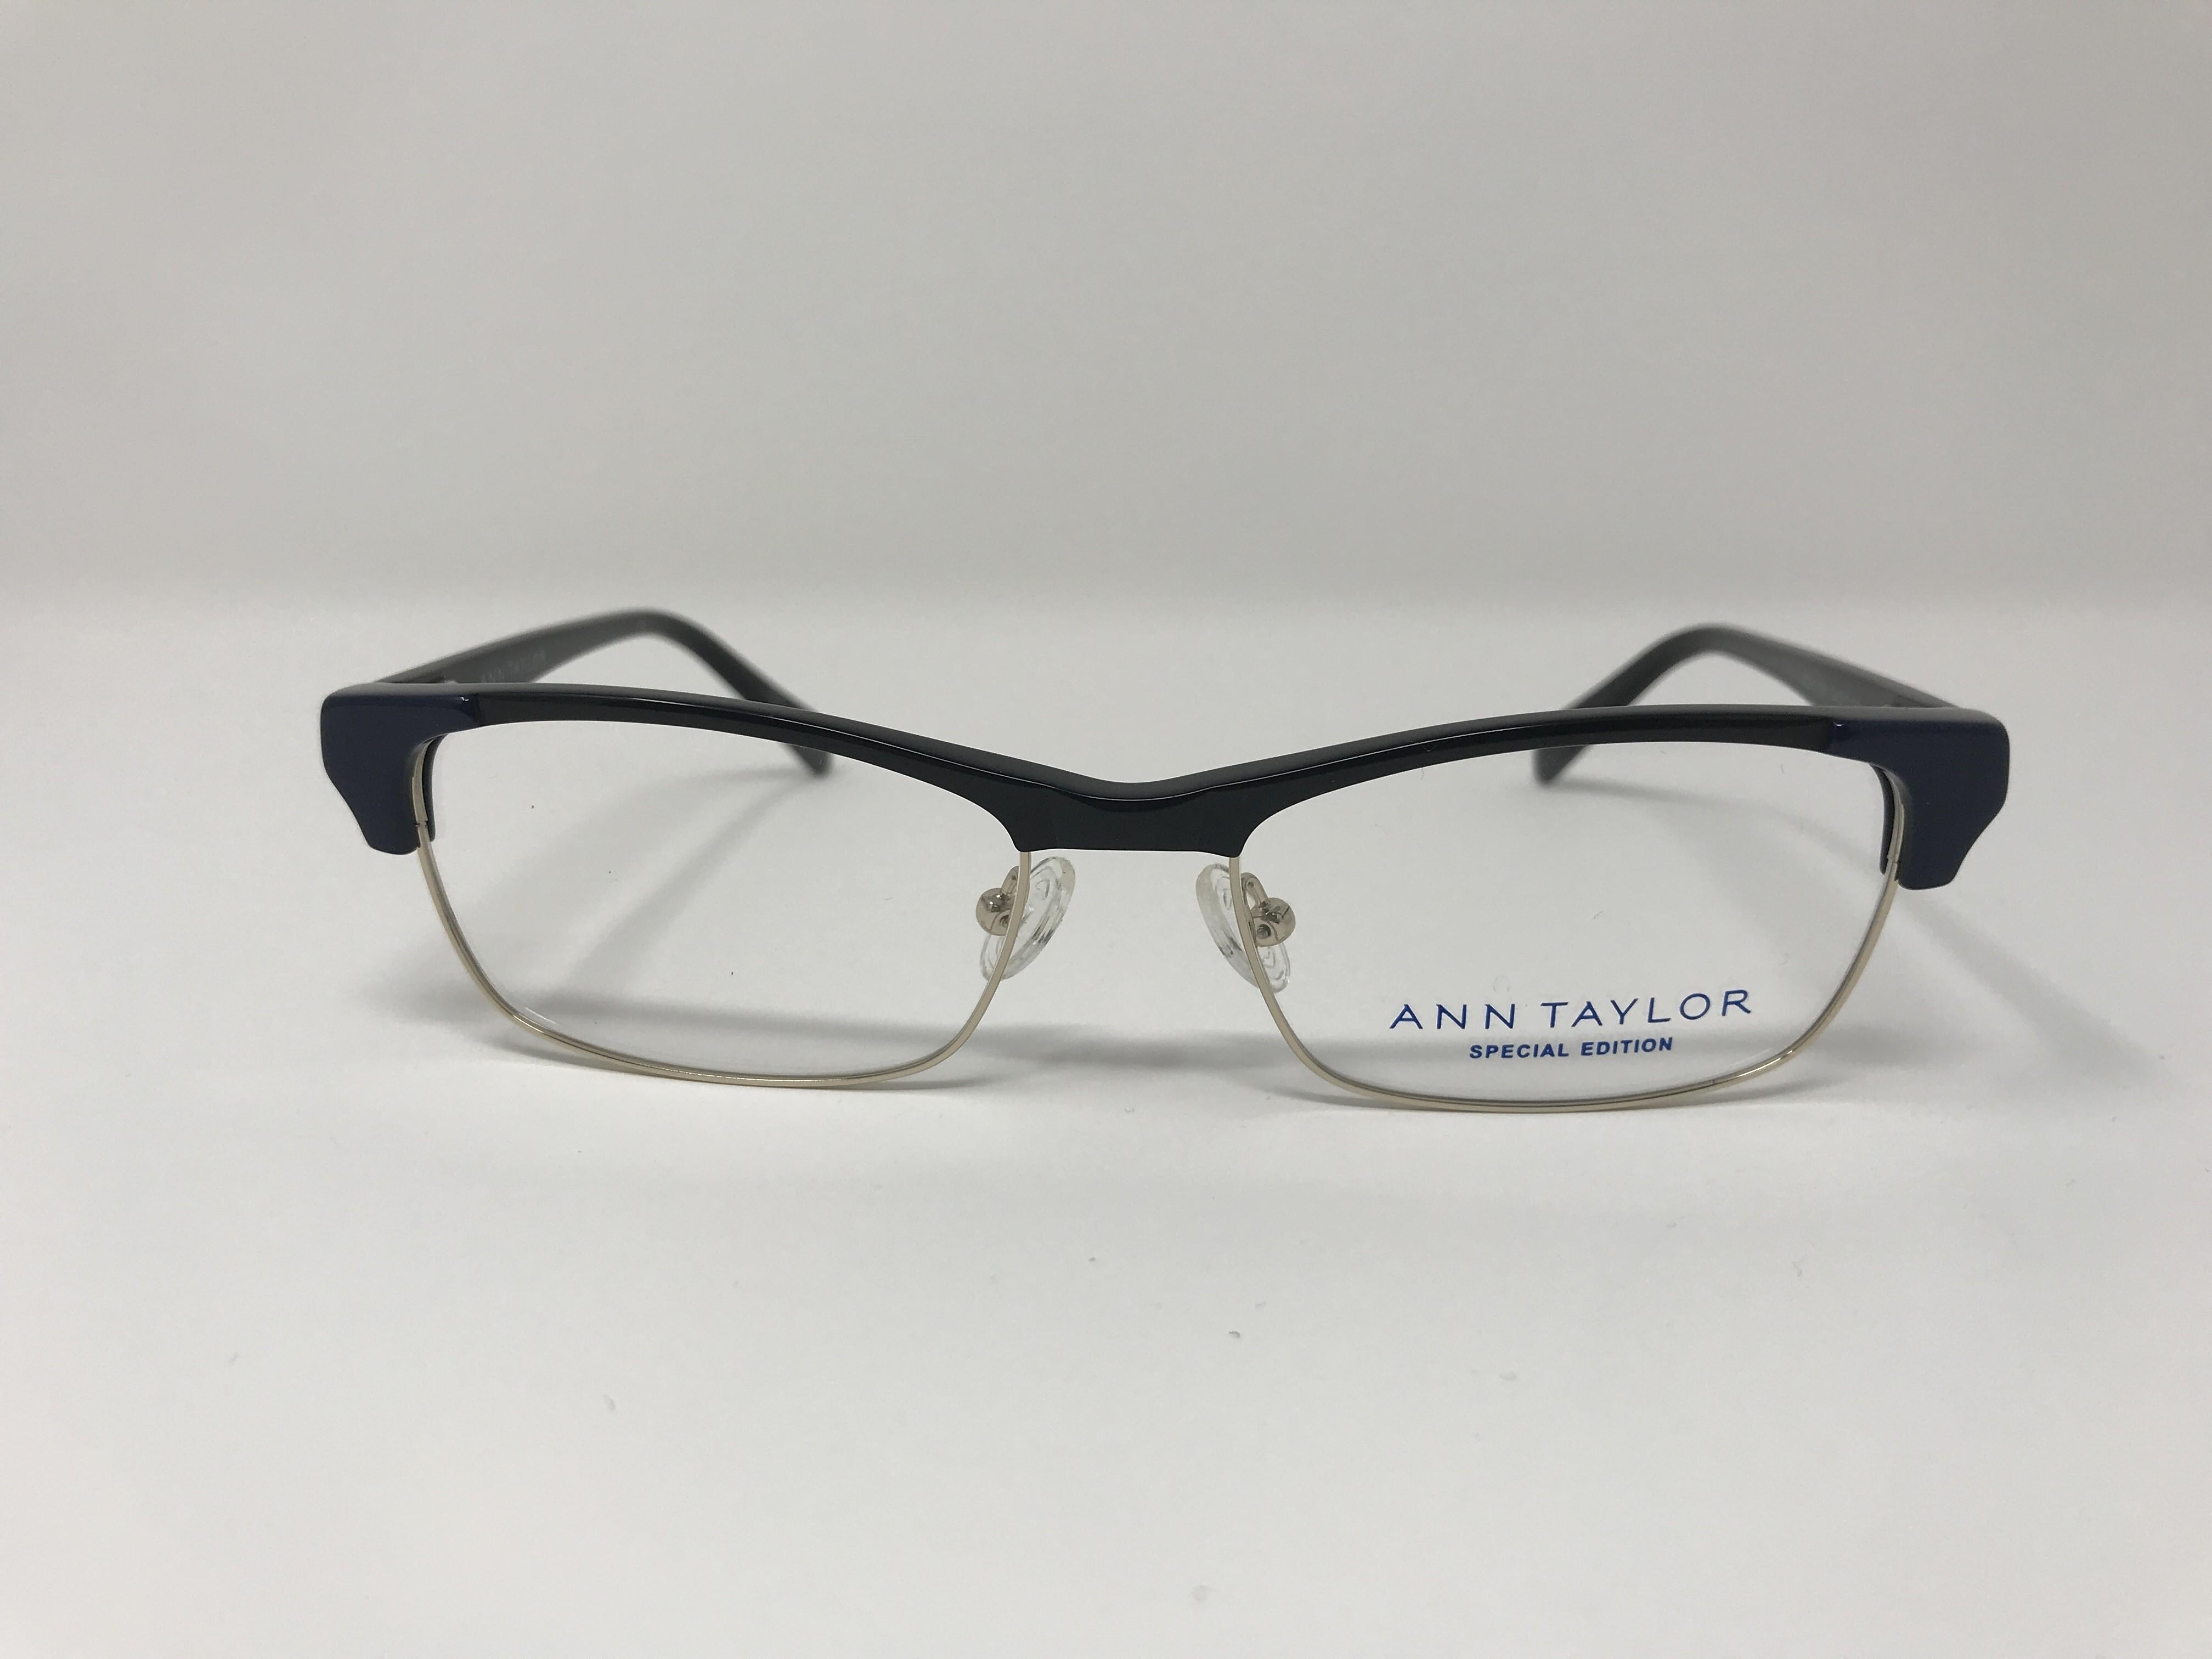 9a71edd43da Ann Taylor AT213 Women s Eyeglasses